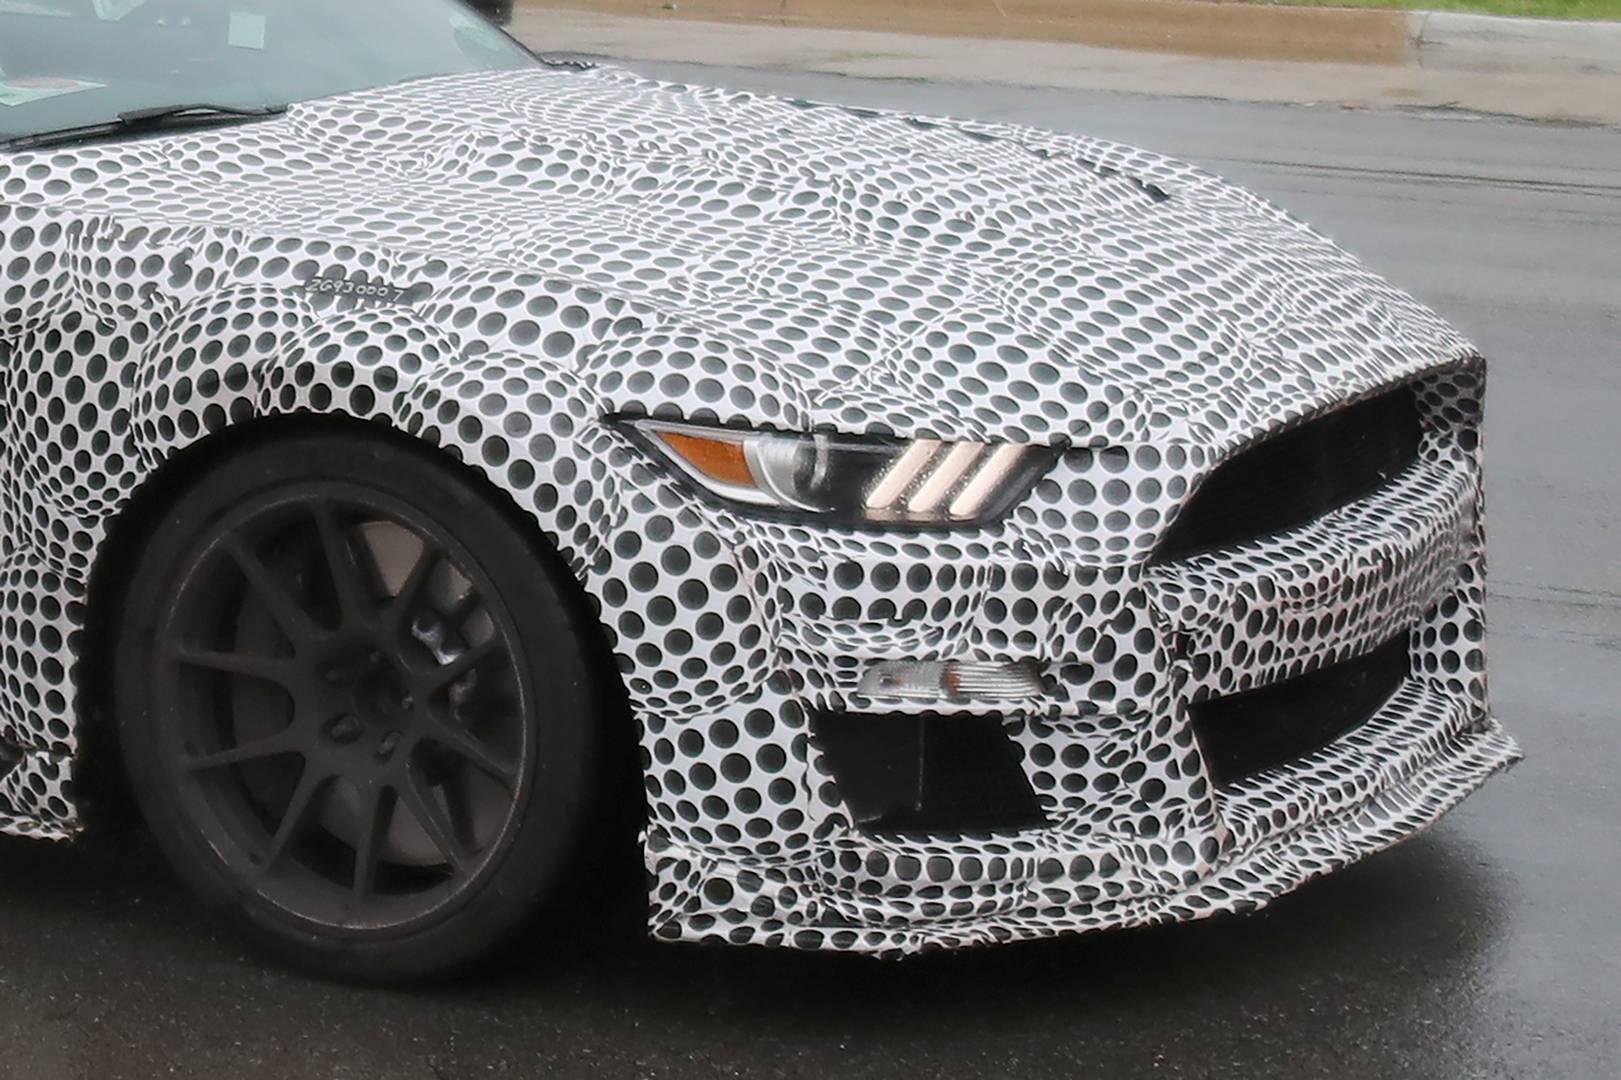 Ford Mustang Shelby GT500 представляет топовый автомобиль линейки Ford Mustang.